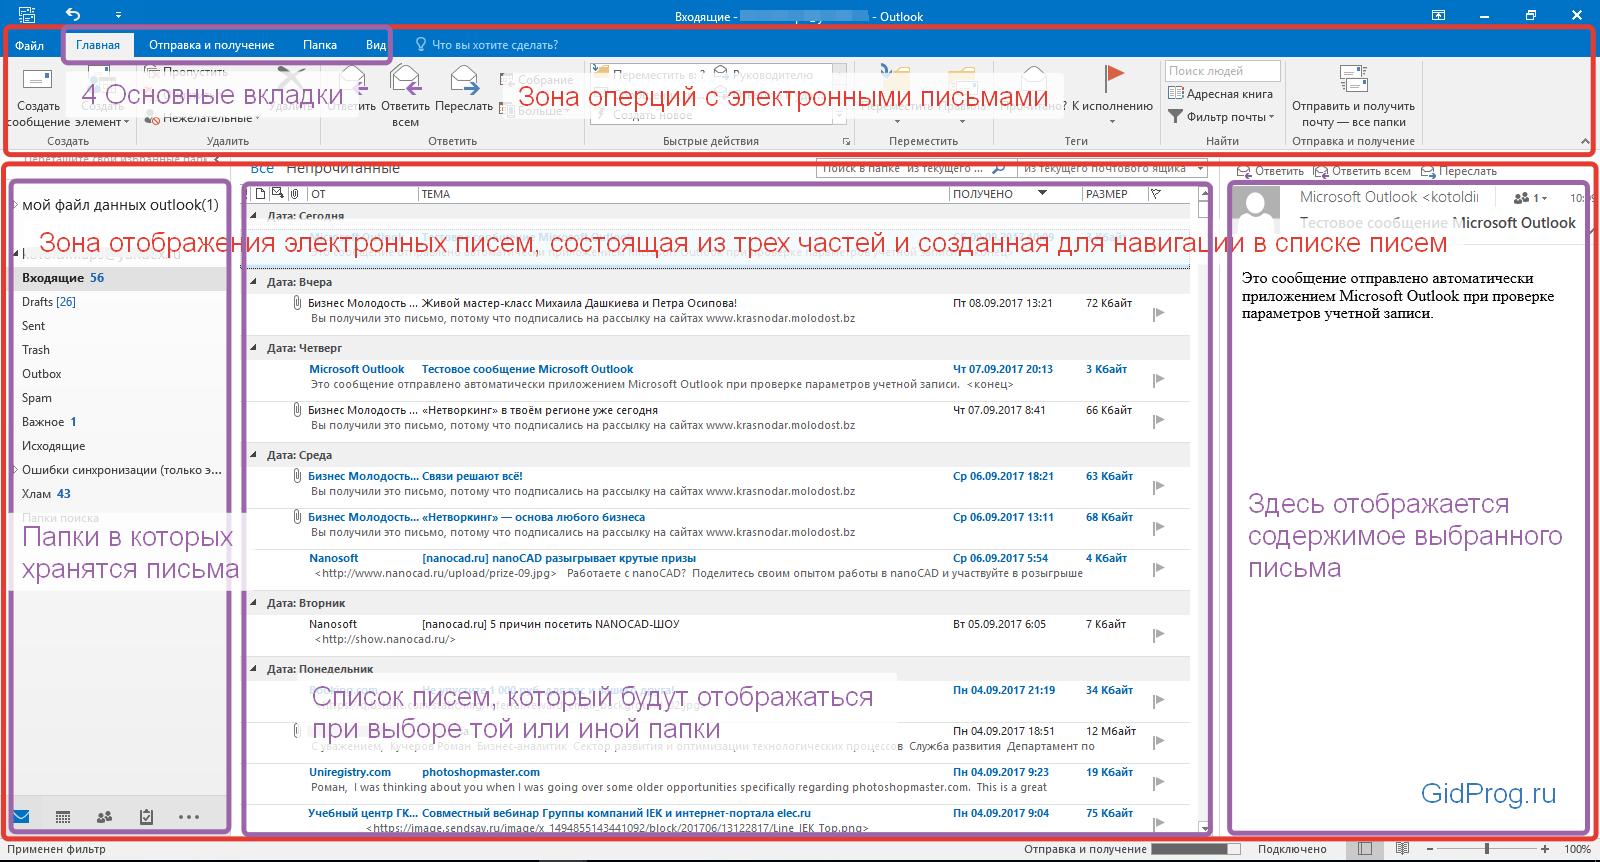 Интерфейс Outlook